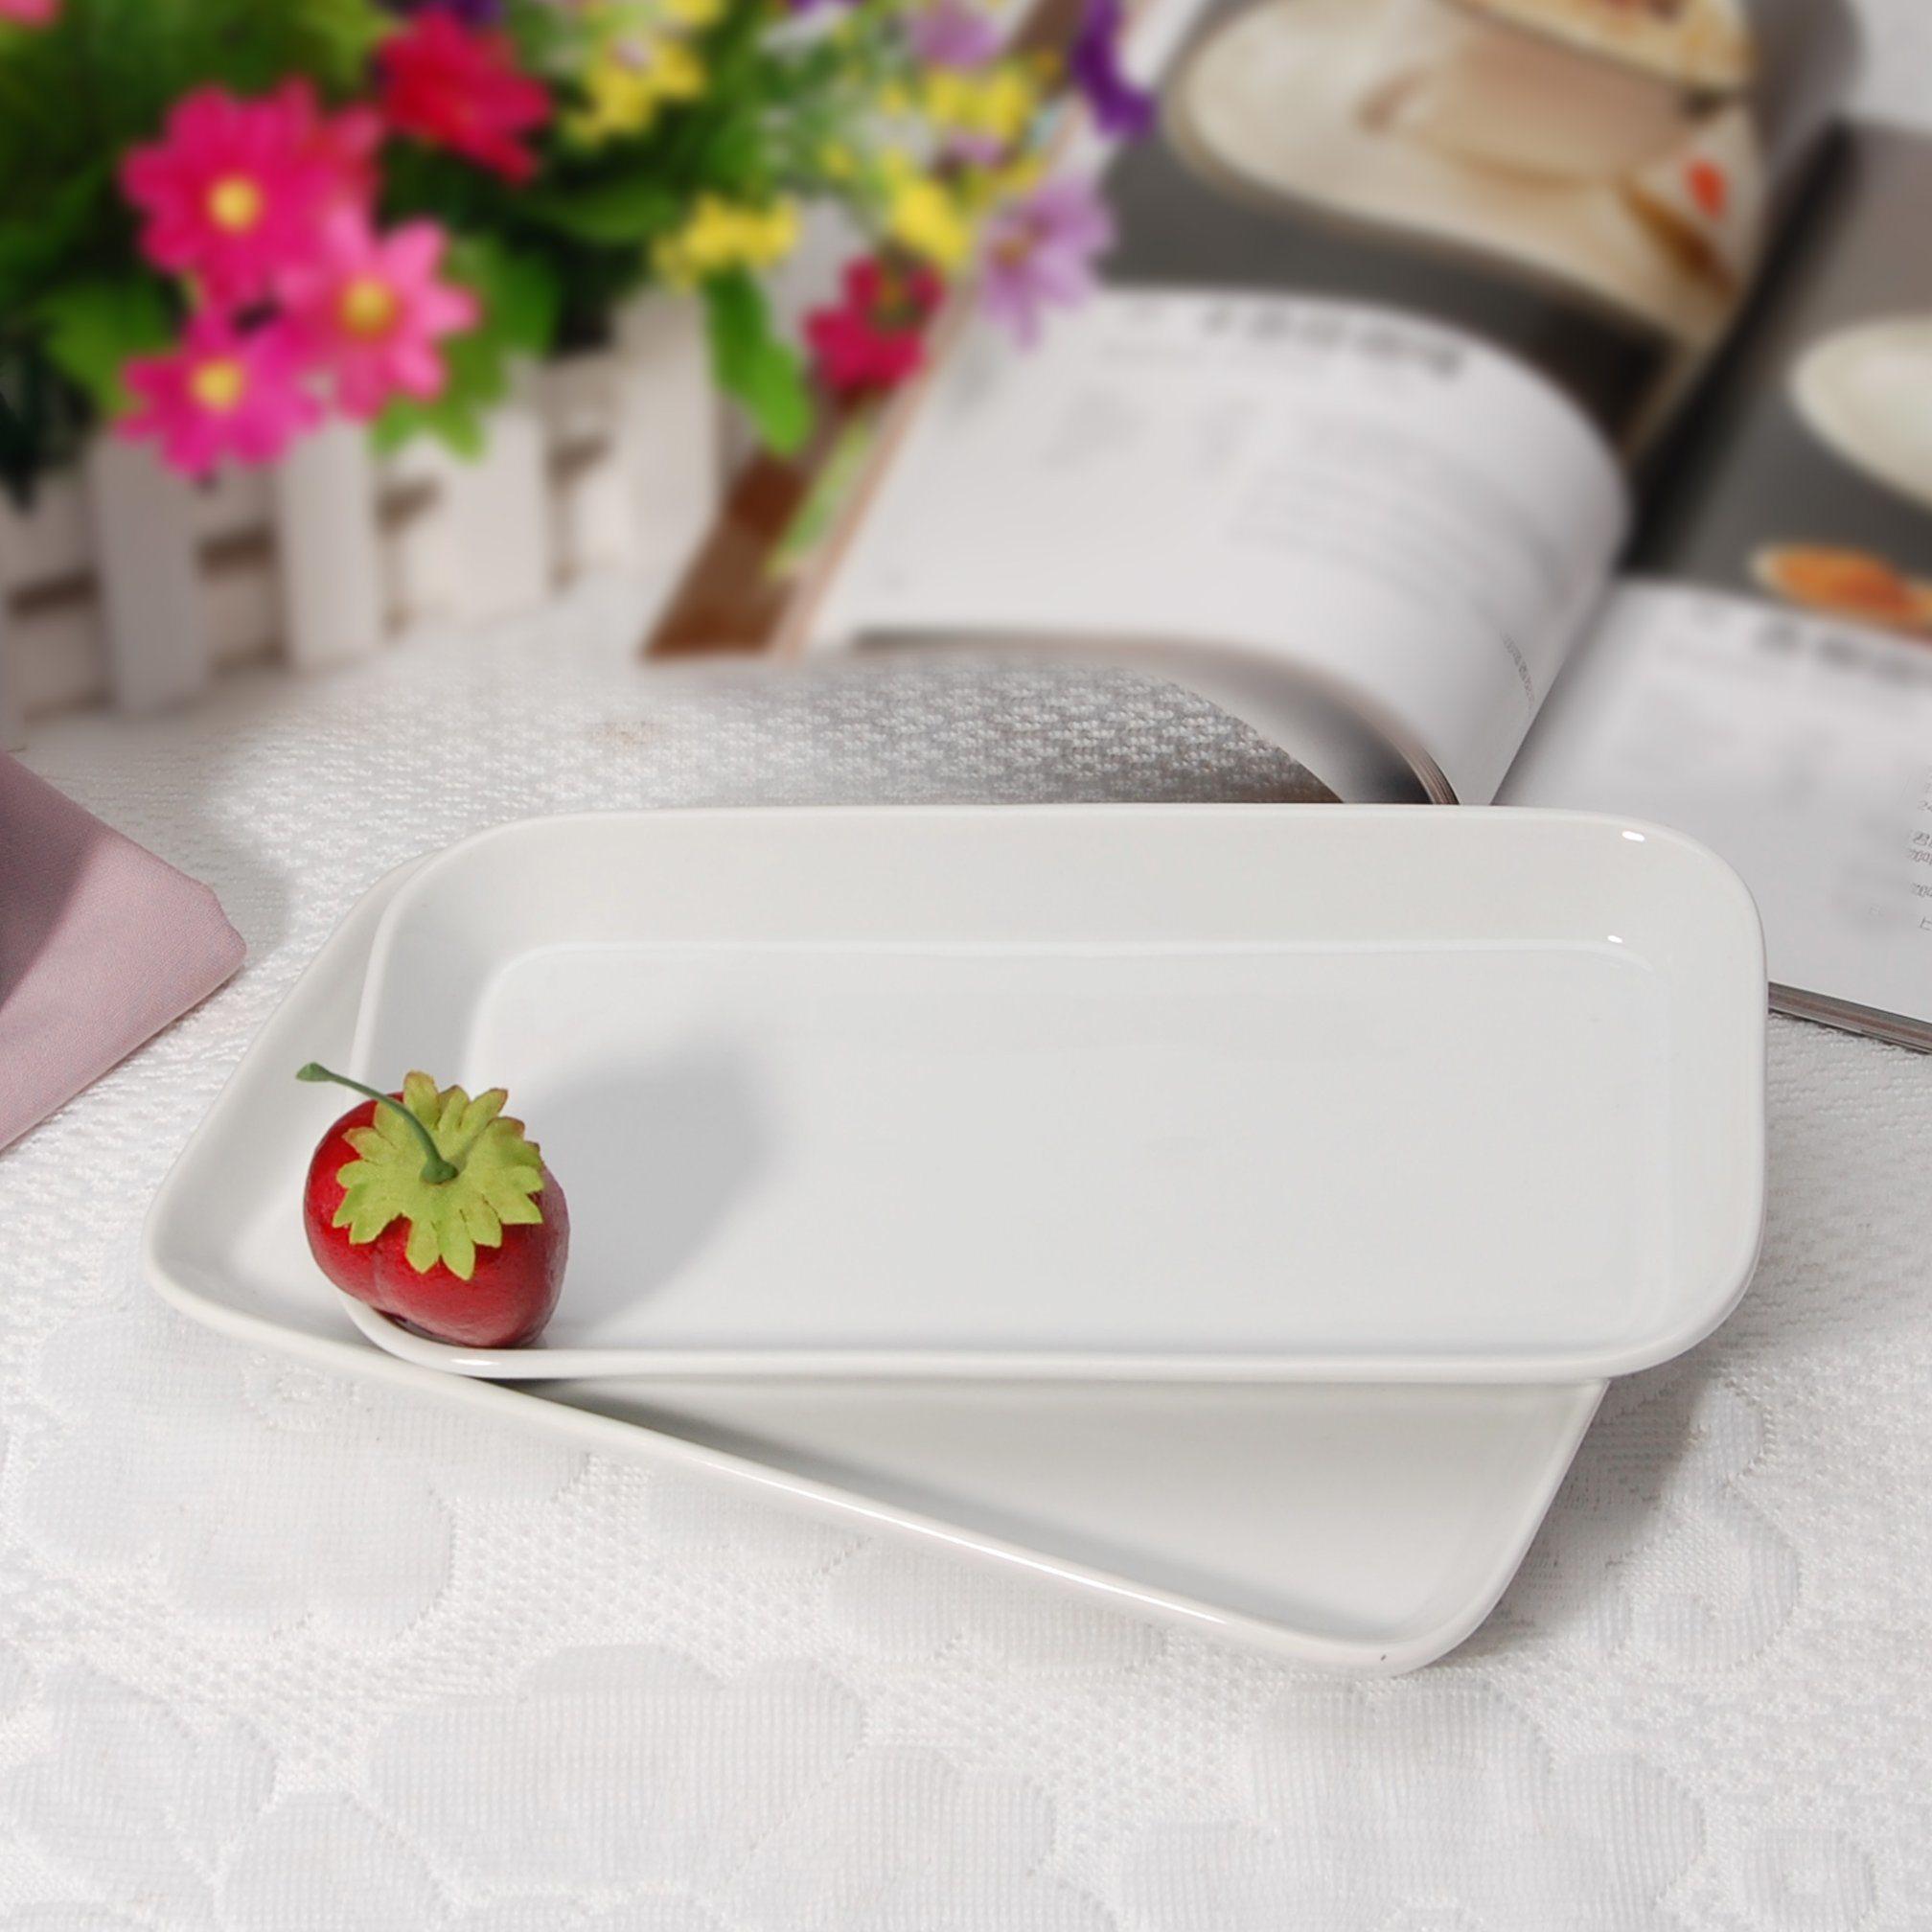 Mobile Porcelain Restaurant Rectangular Plates for Wholesales